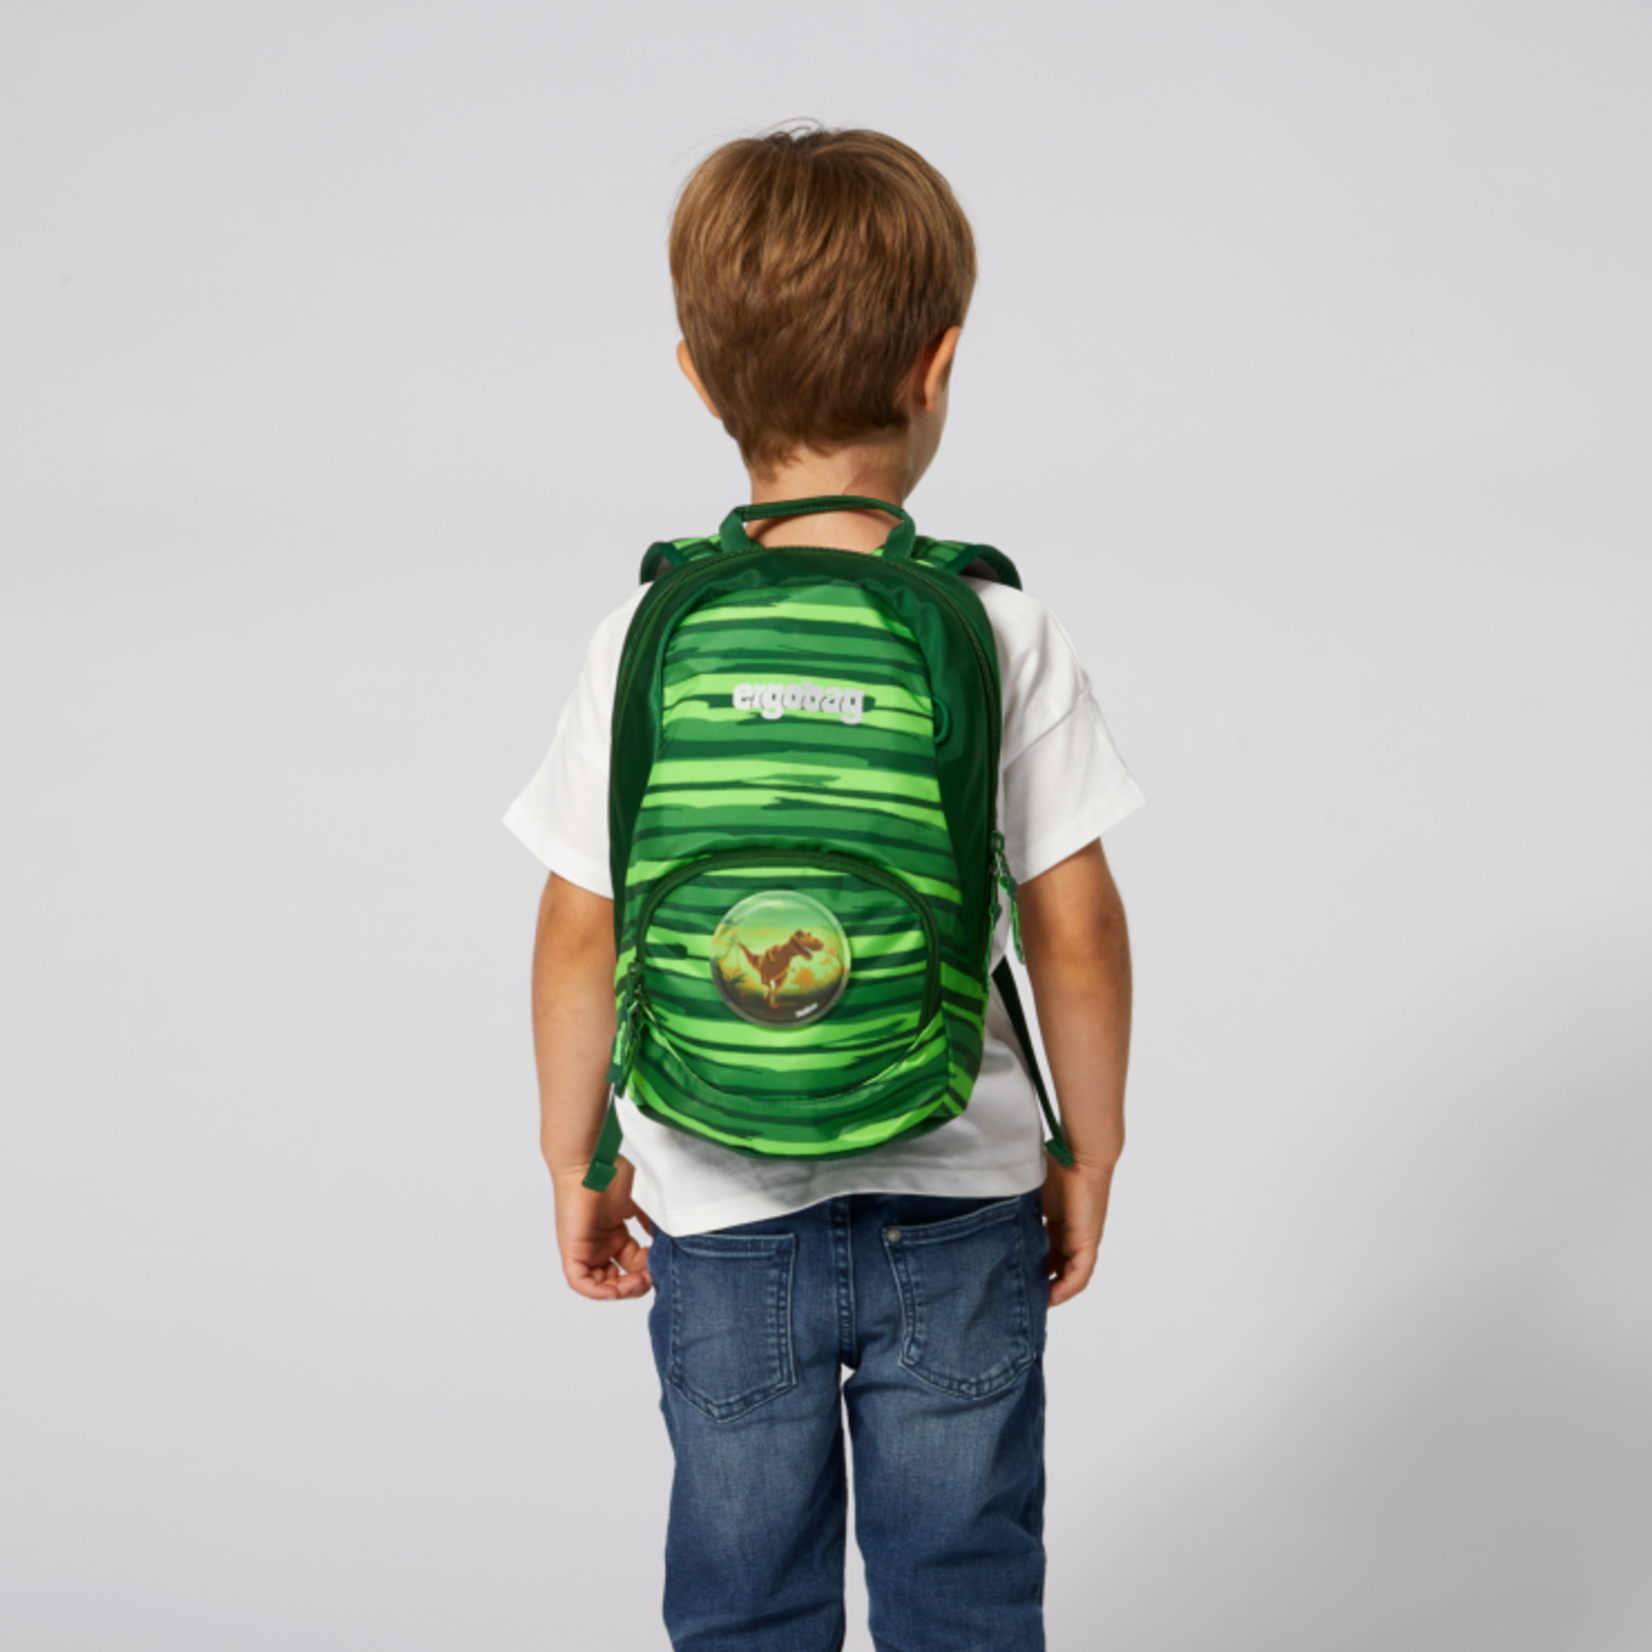 ERGOBAG ease small Kinderrucksack Bärtram